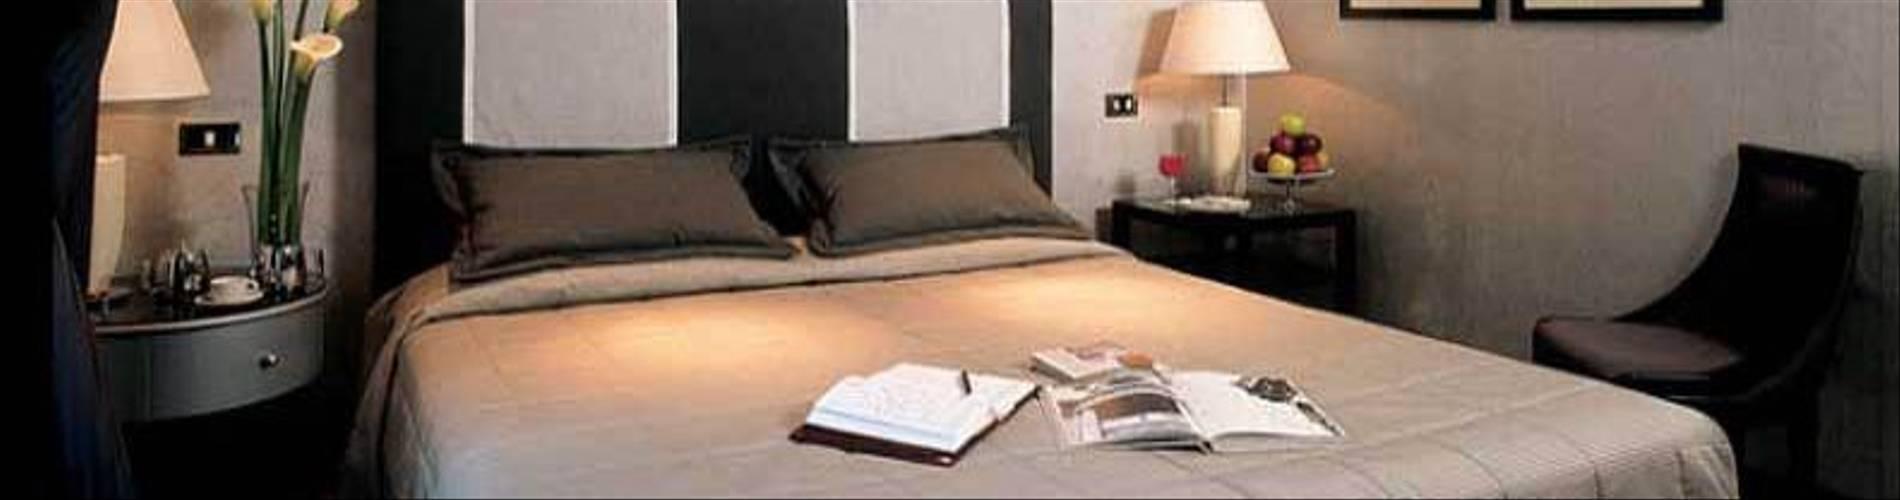 MORGANA HOTELimage22.jpg